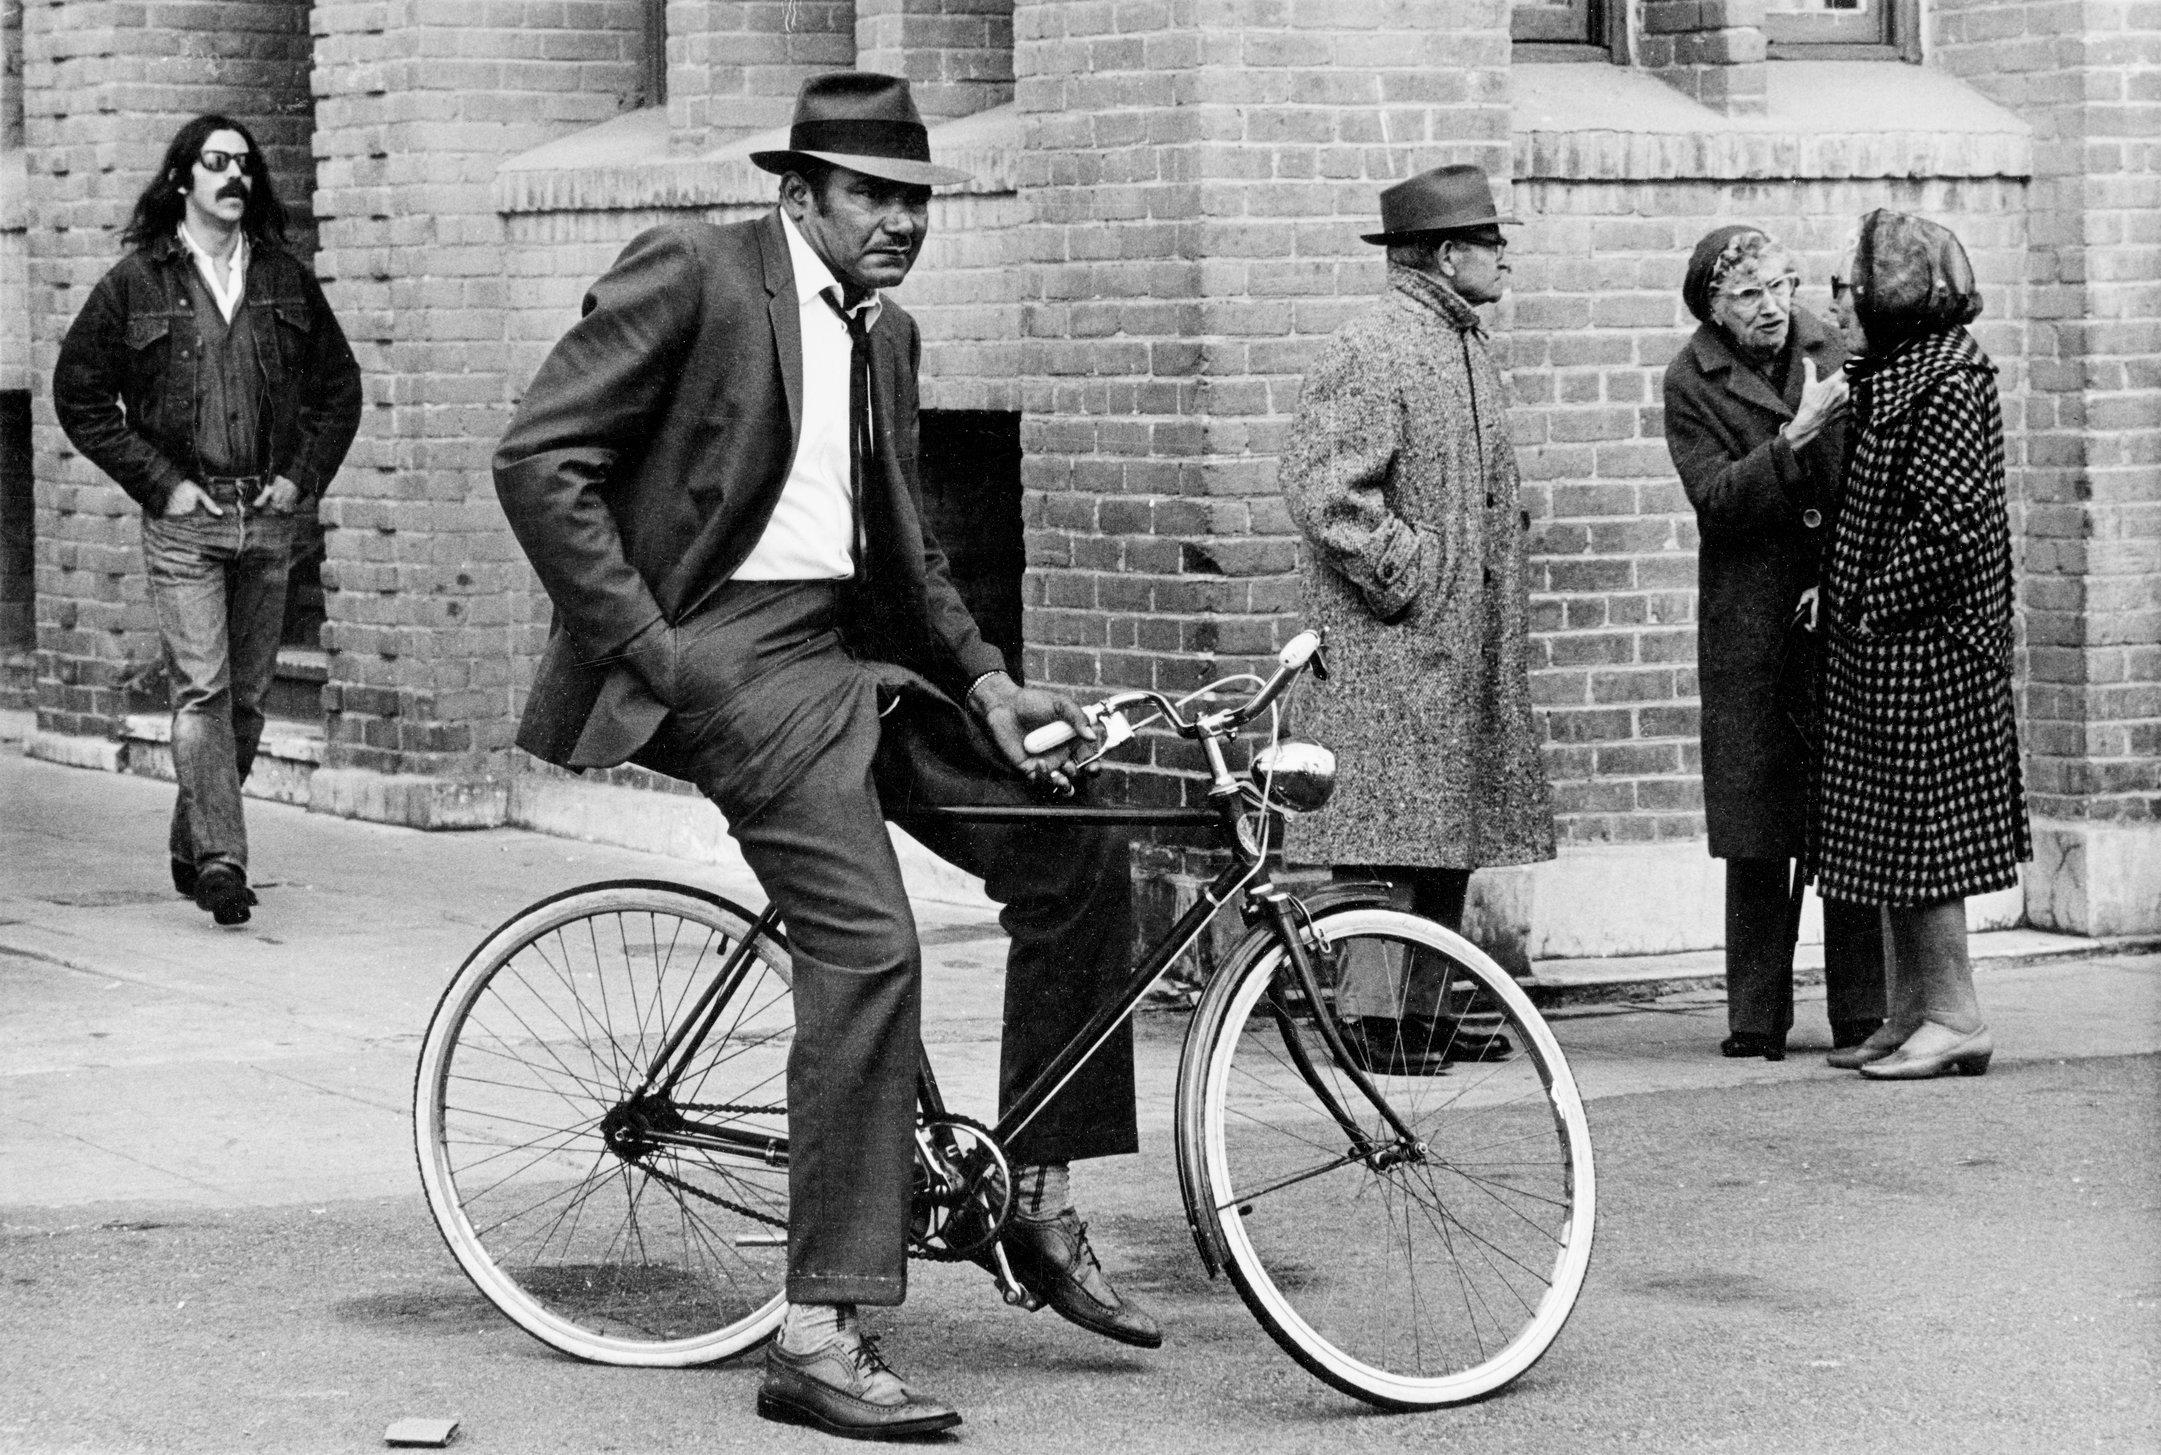 Venice boardwalk man on bike.jpg